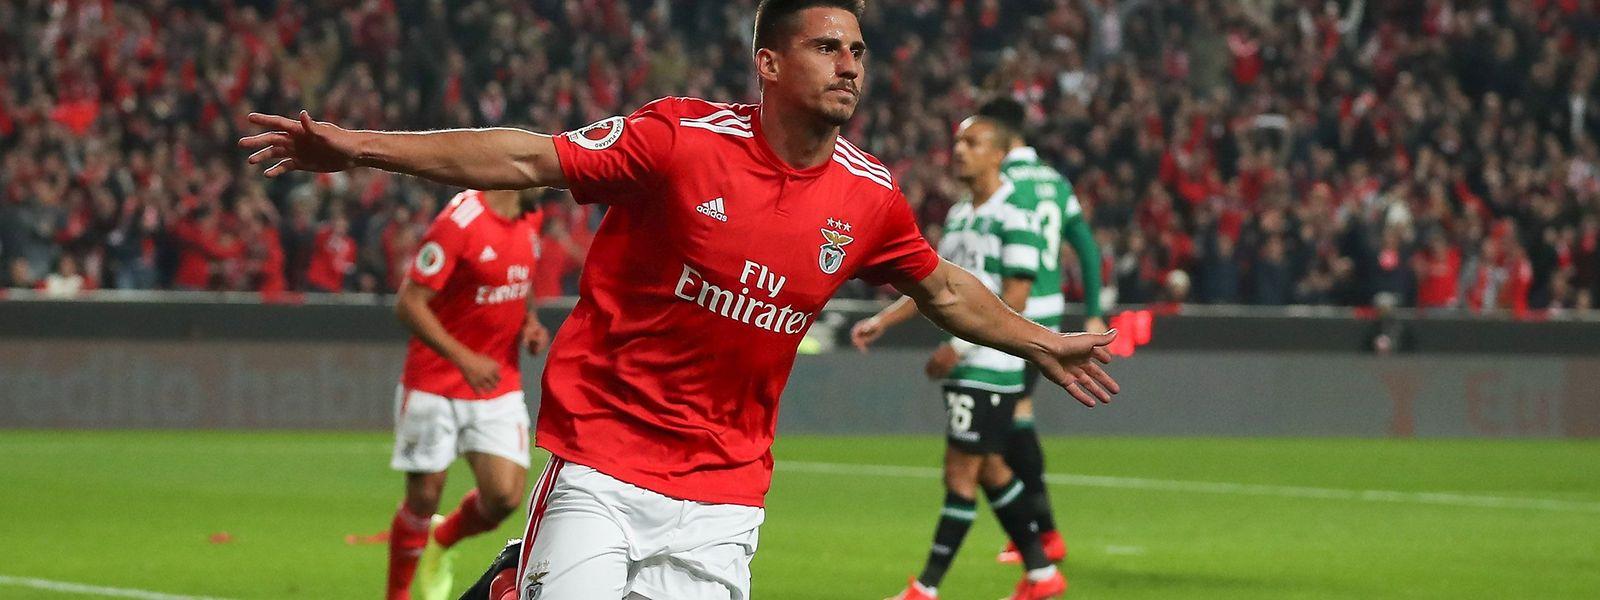 Gabriel abriu o marcador para o Benfica no estádio da Luz.